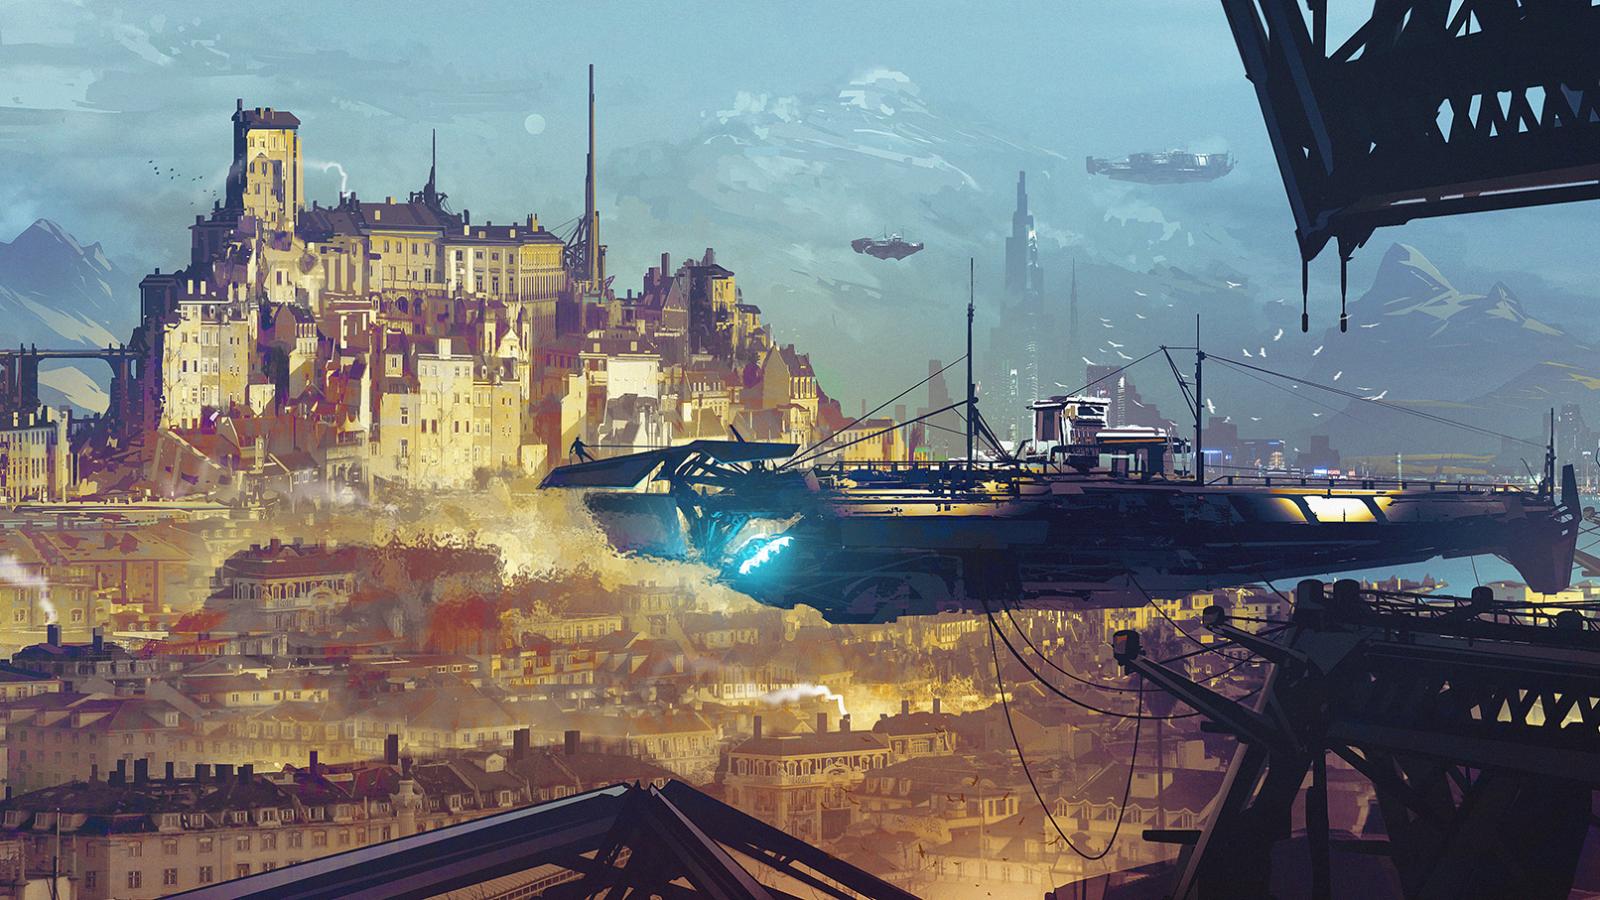 General 1600x900 digital art futuristic futuristic city spaceship building dock mountains science fiction city